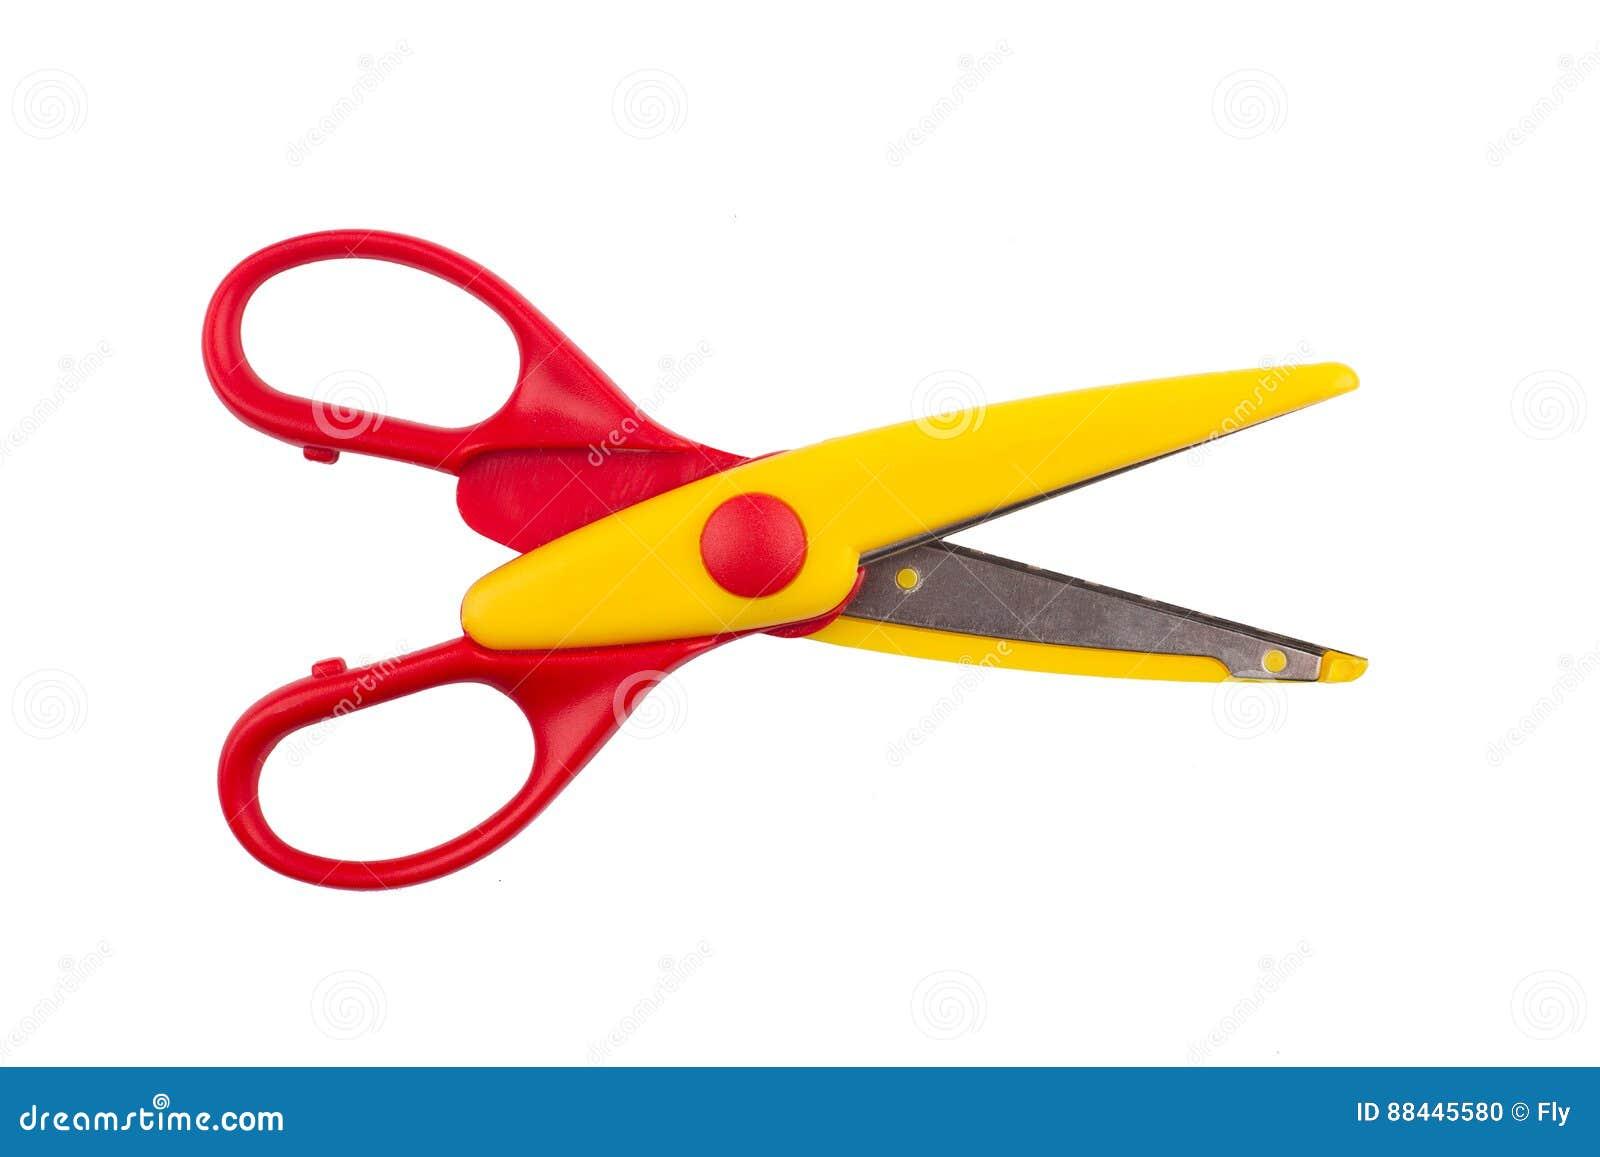 Pair of open red scissors